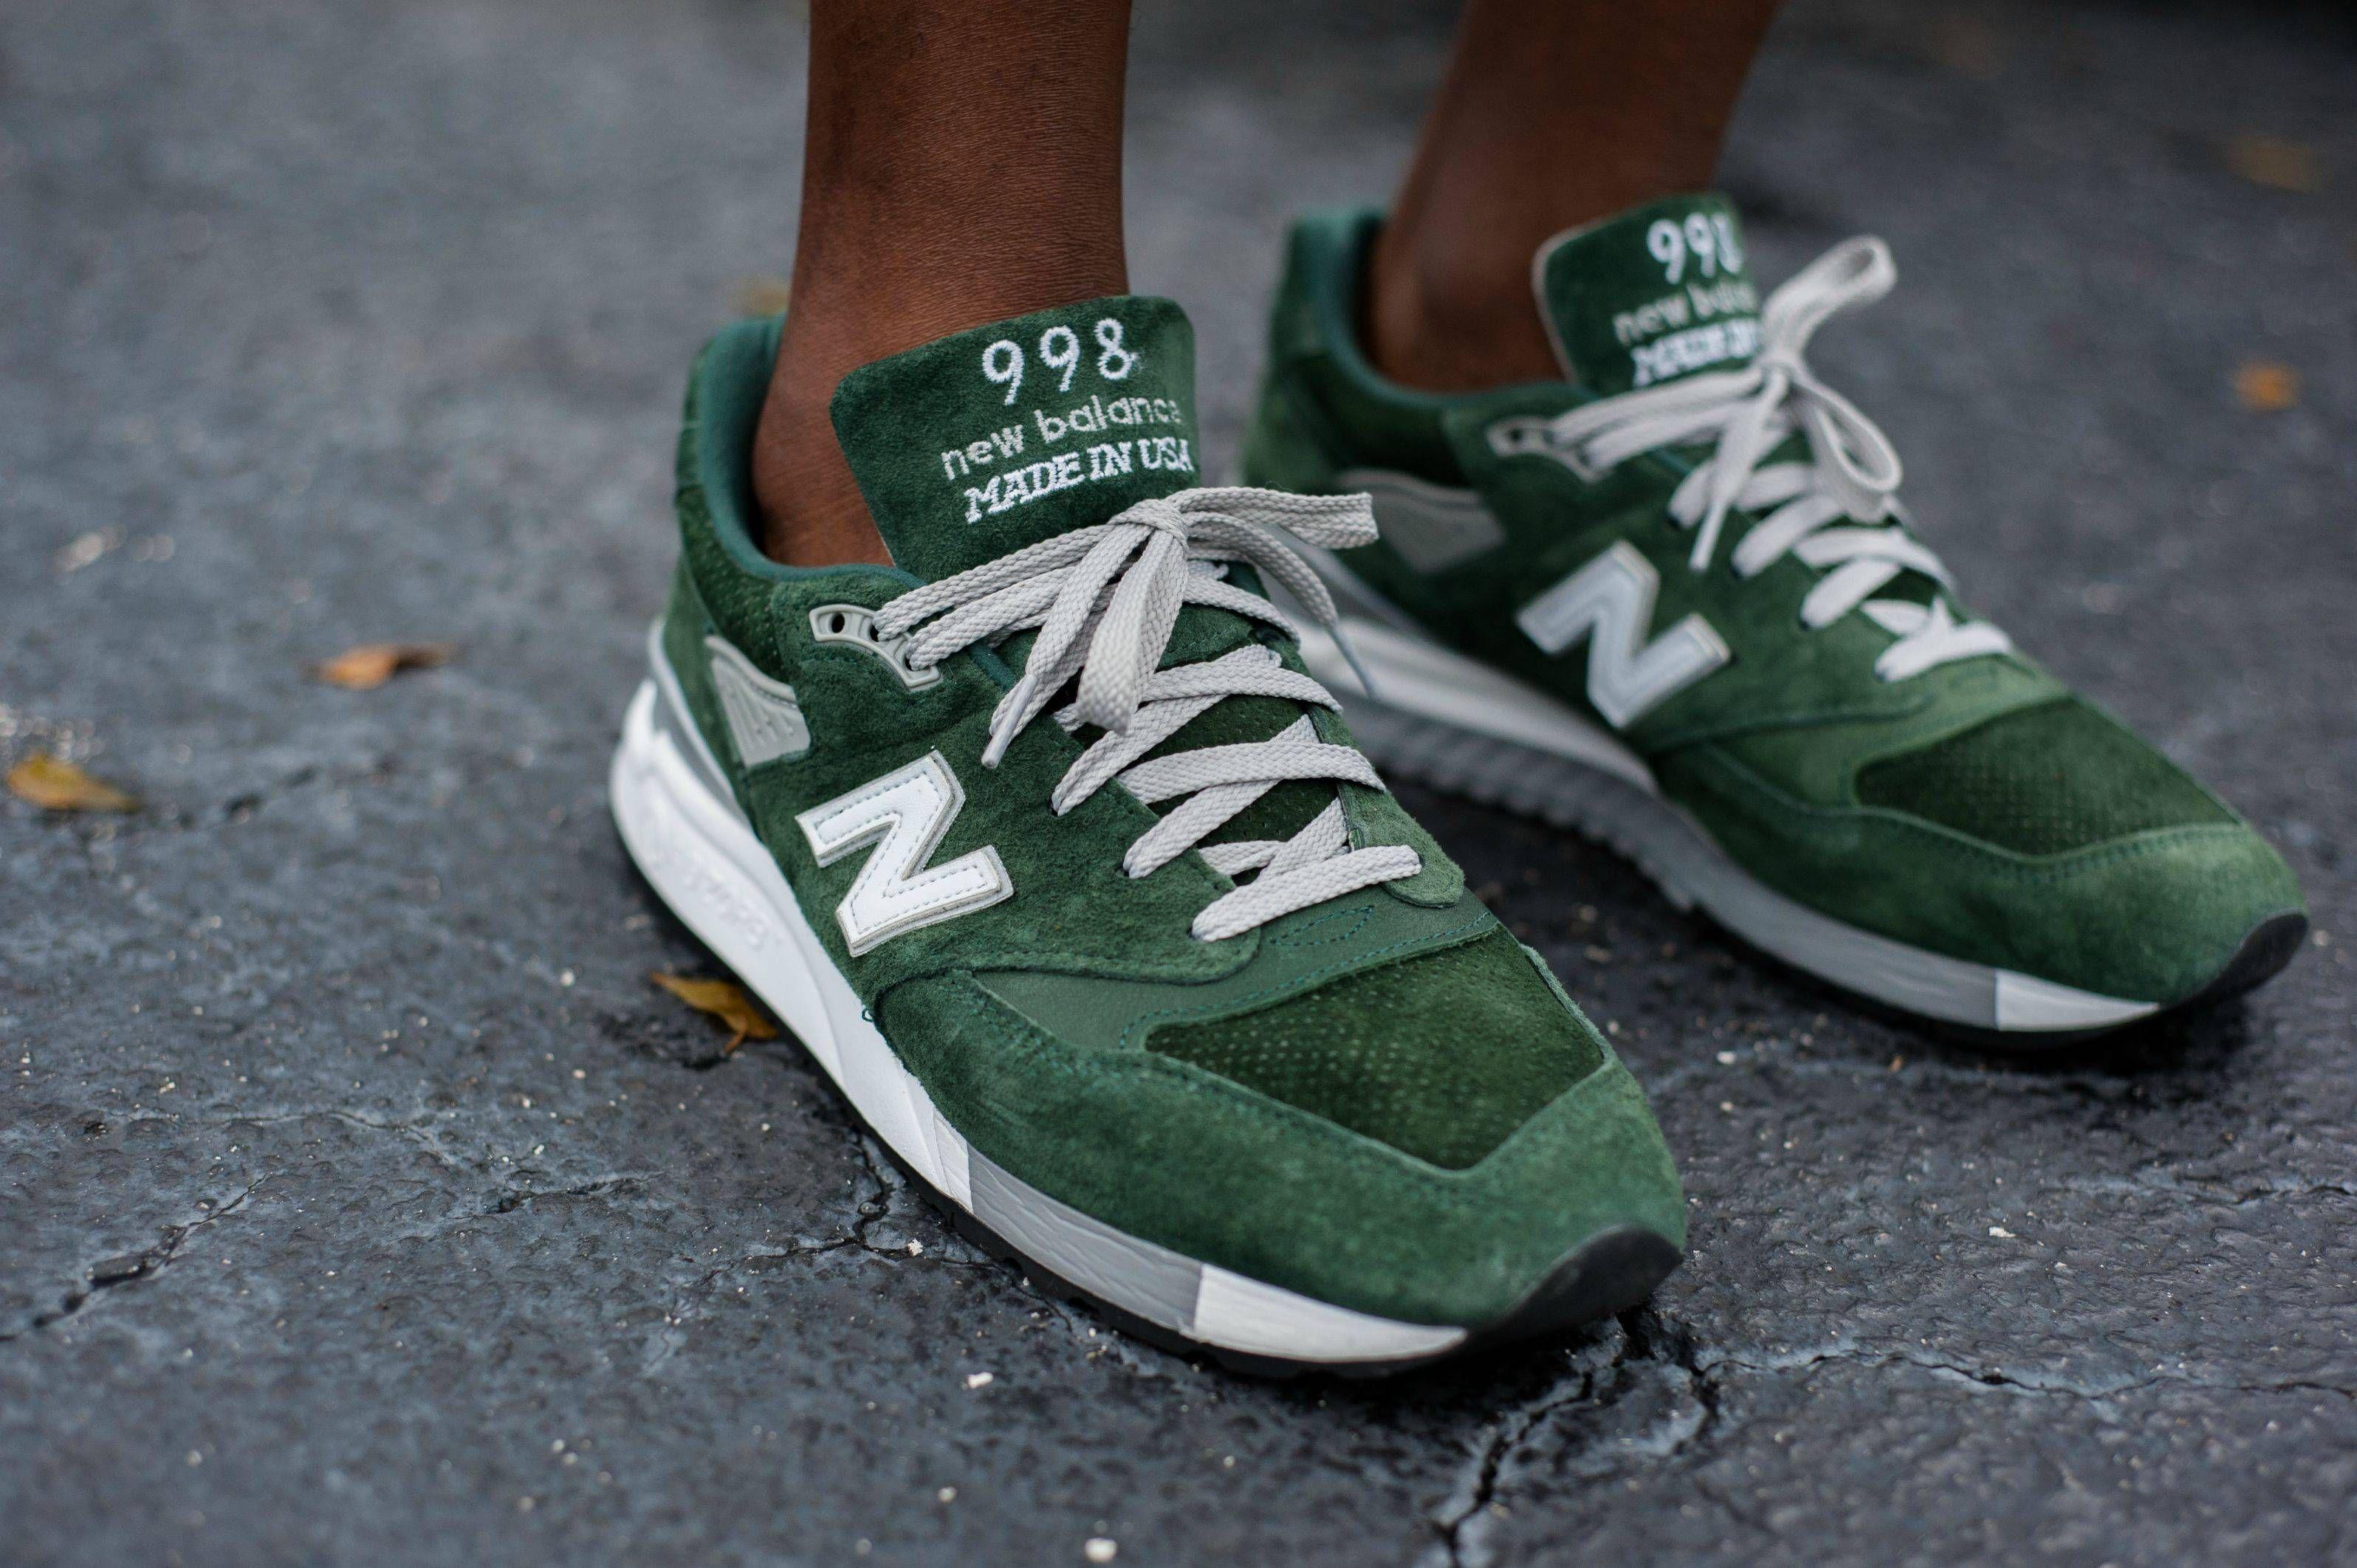 new balance 998 forest green